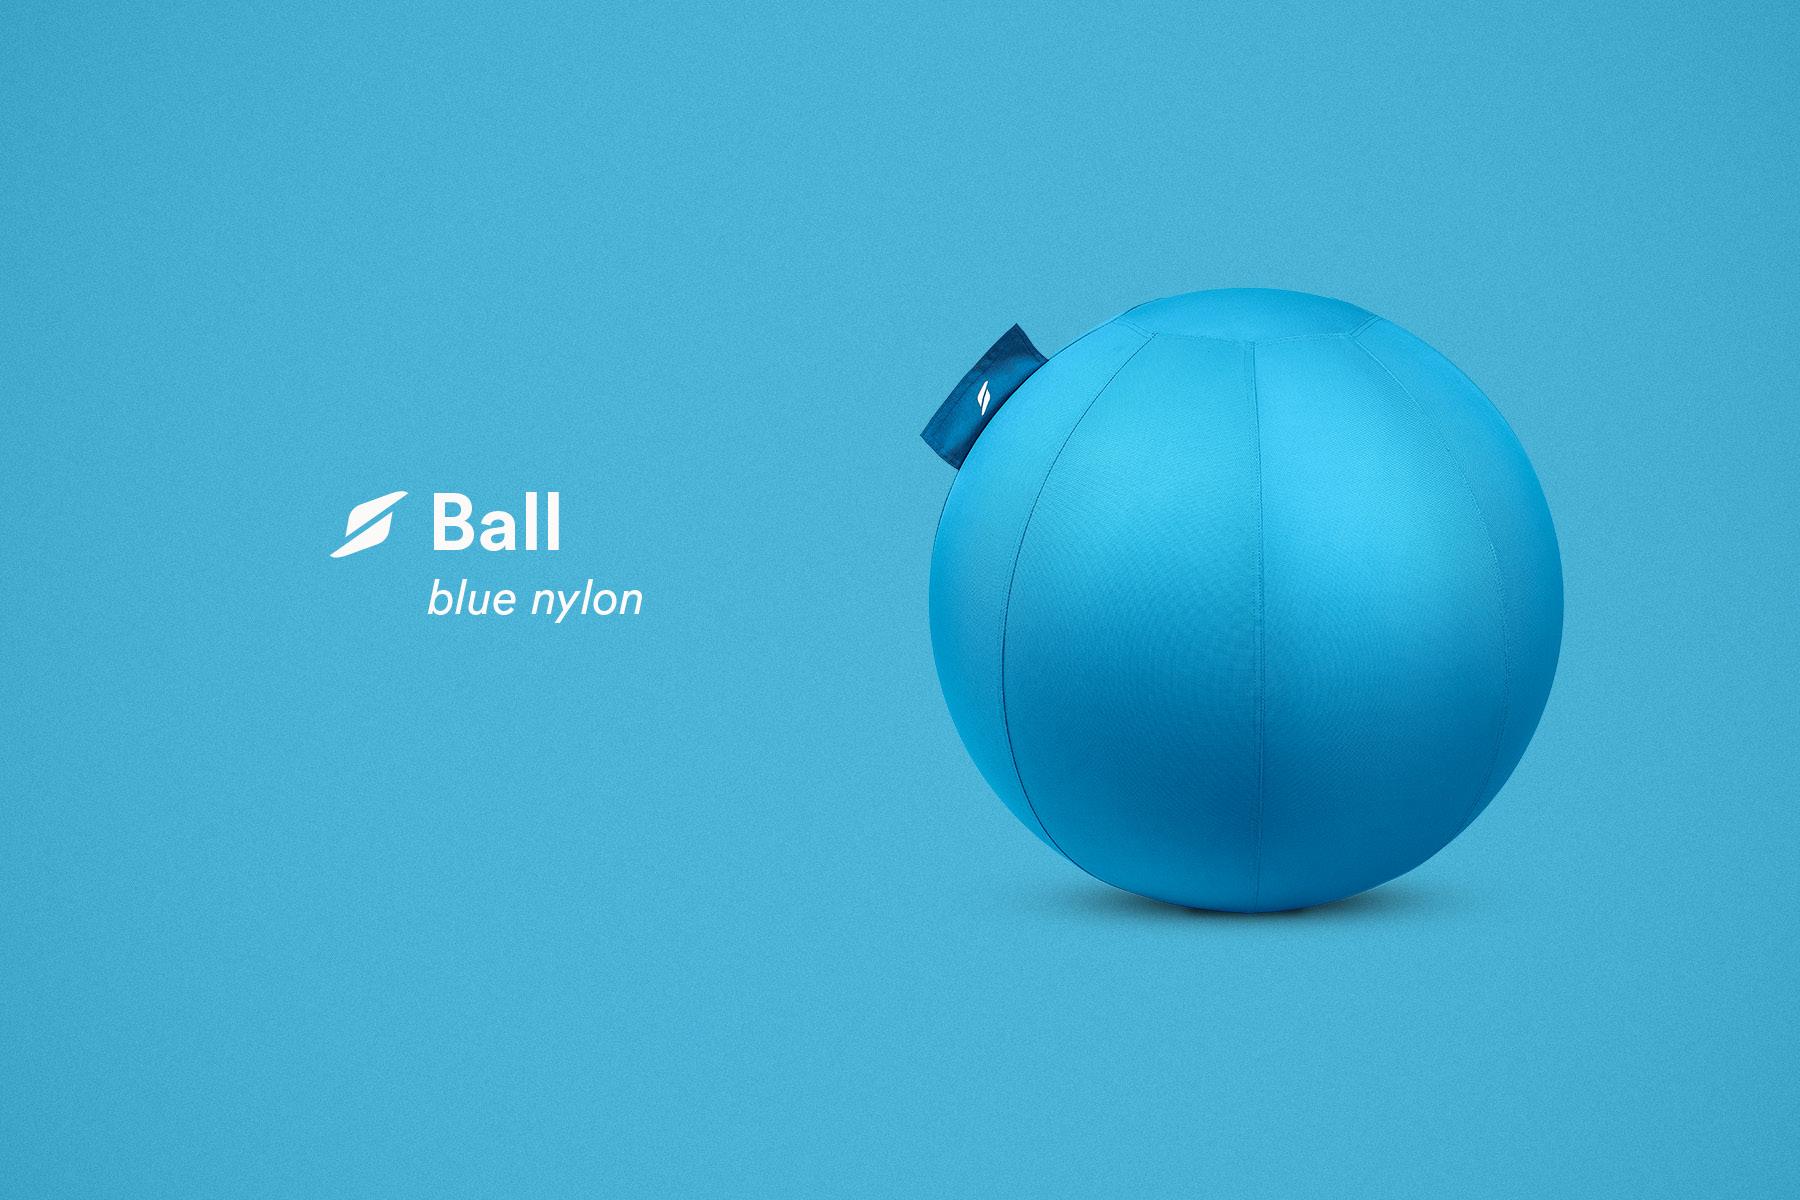 stryve-ball-produkt-award-entwurf-designagentur